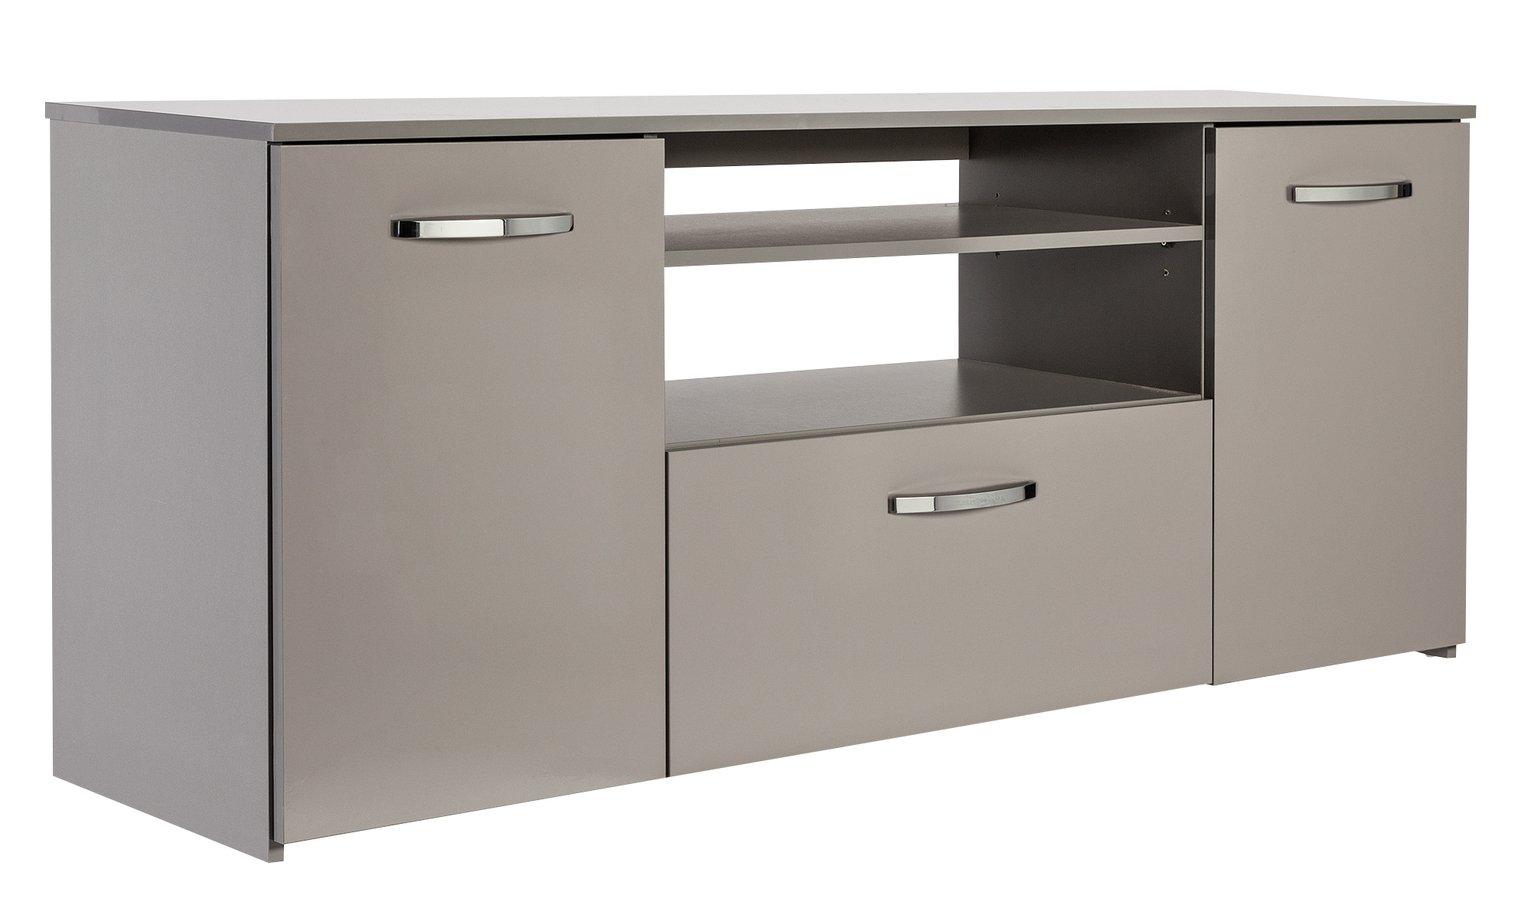 Argos Home Hayward TV & Sideboard Unit - Grey Gloss